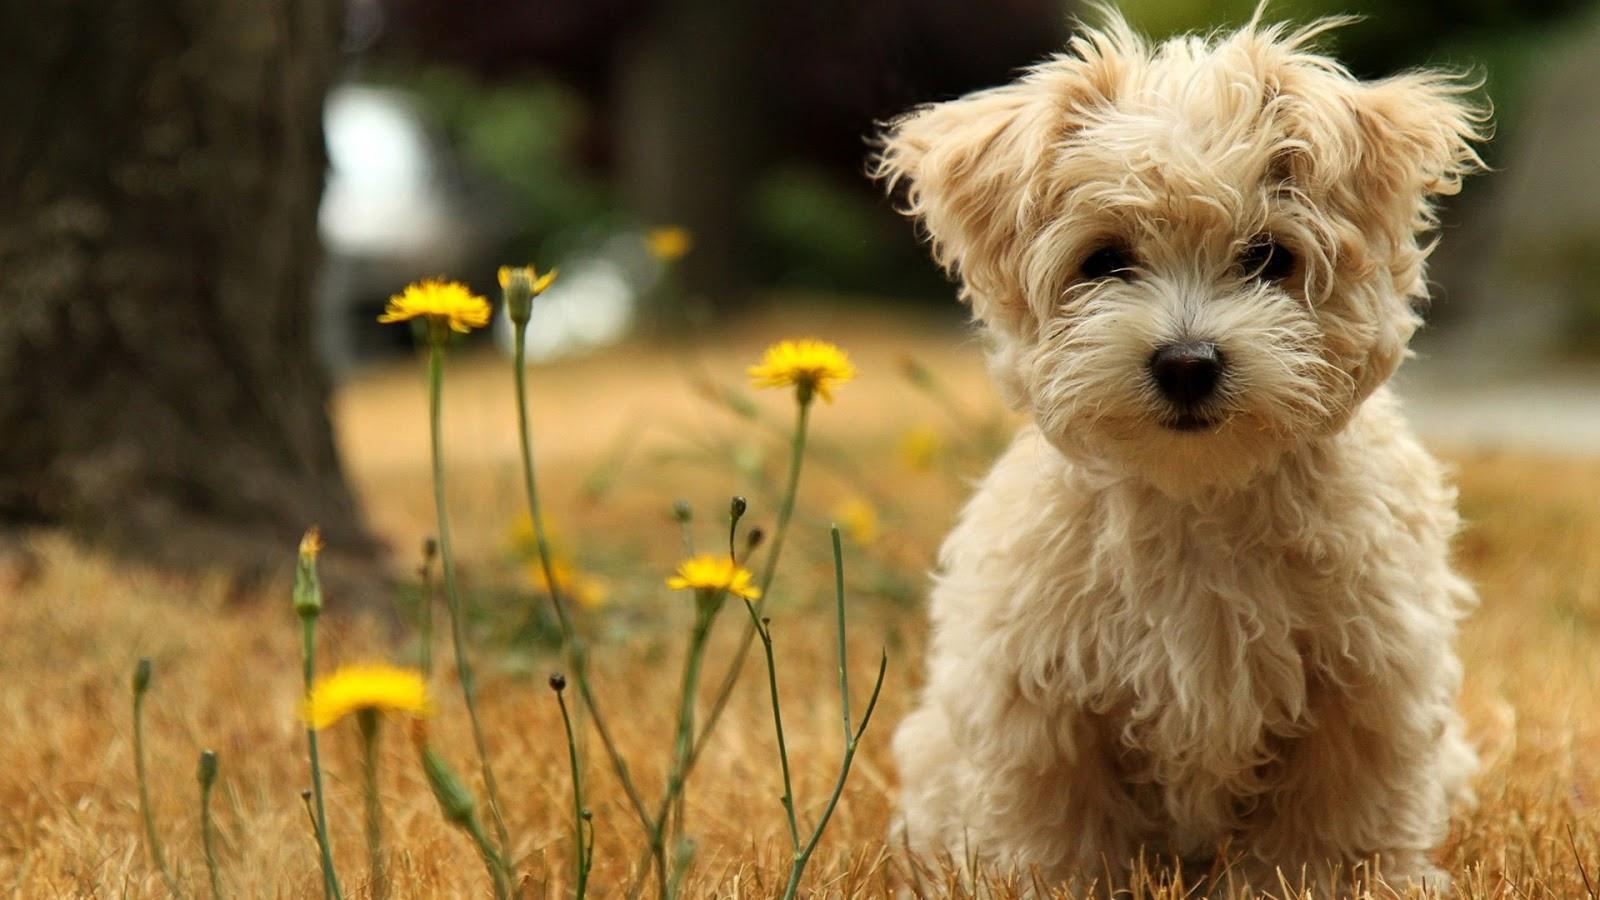 Small Cute Baby Kissing Wallpaper Hd Wallpapers Fine Cute Dog Baby Dog Hd Wallpapers Free